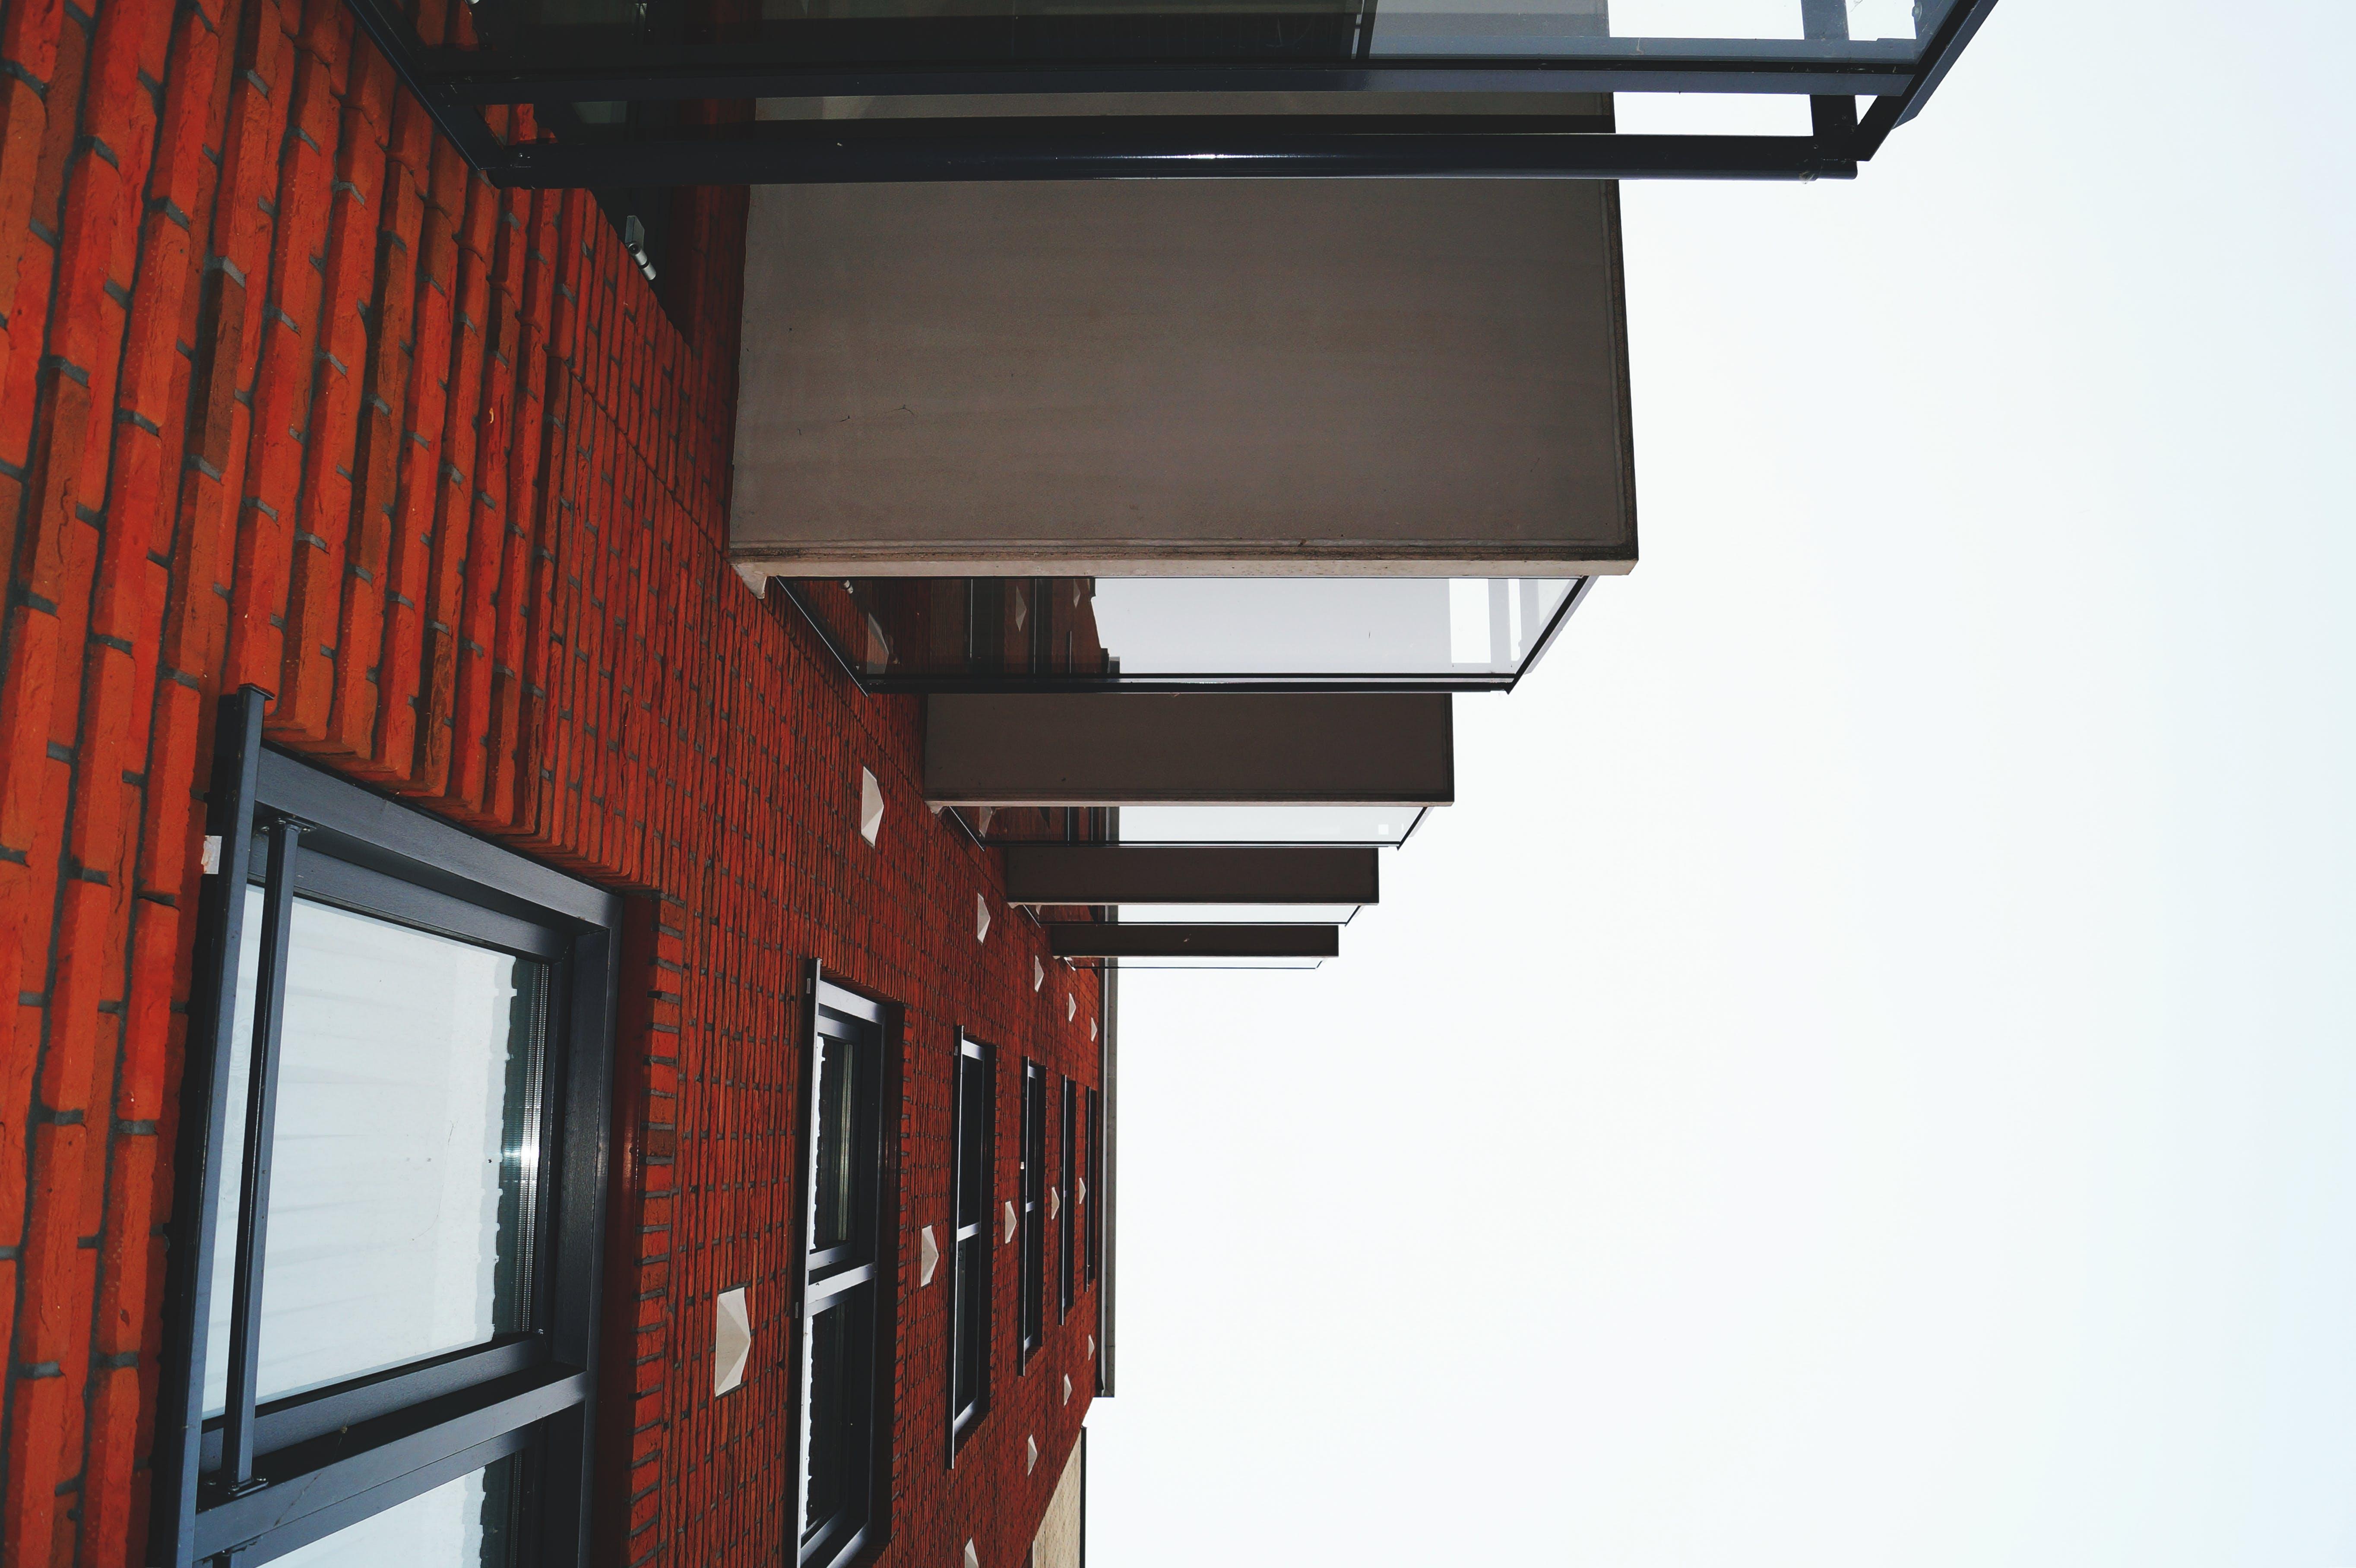 Free stock photo of building, bricks, glass, architecture